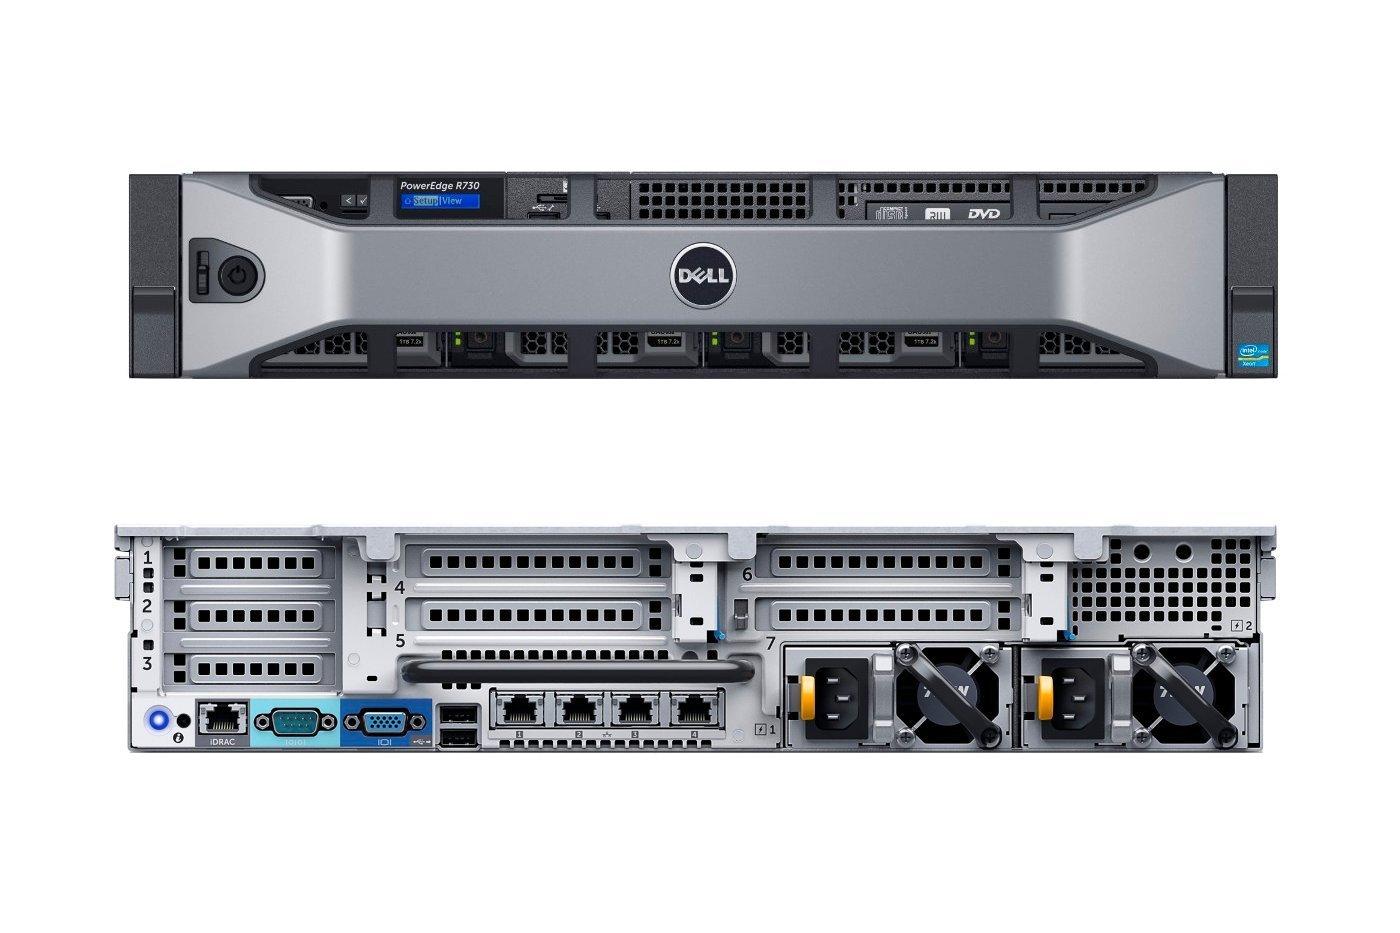 Dell PowerEdge R730 review   IT PRO